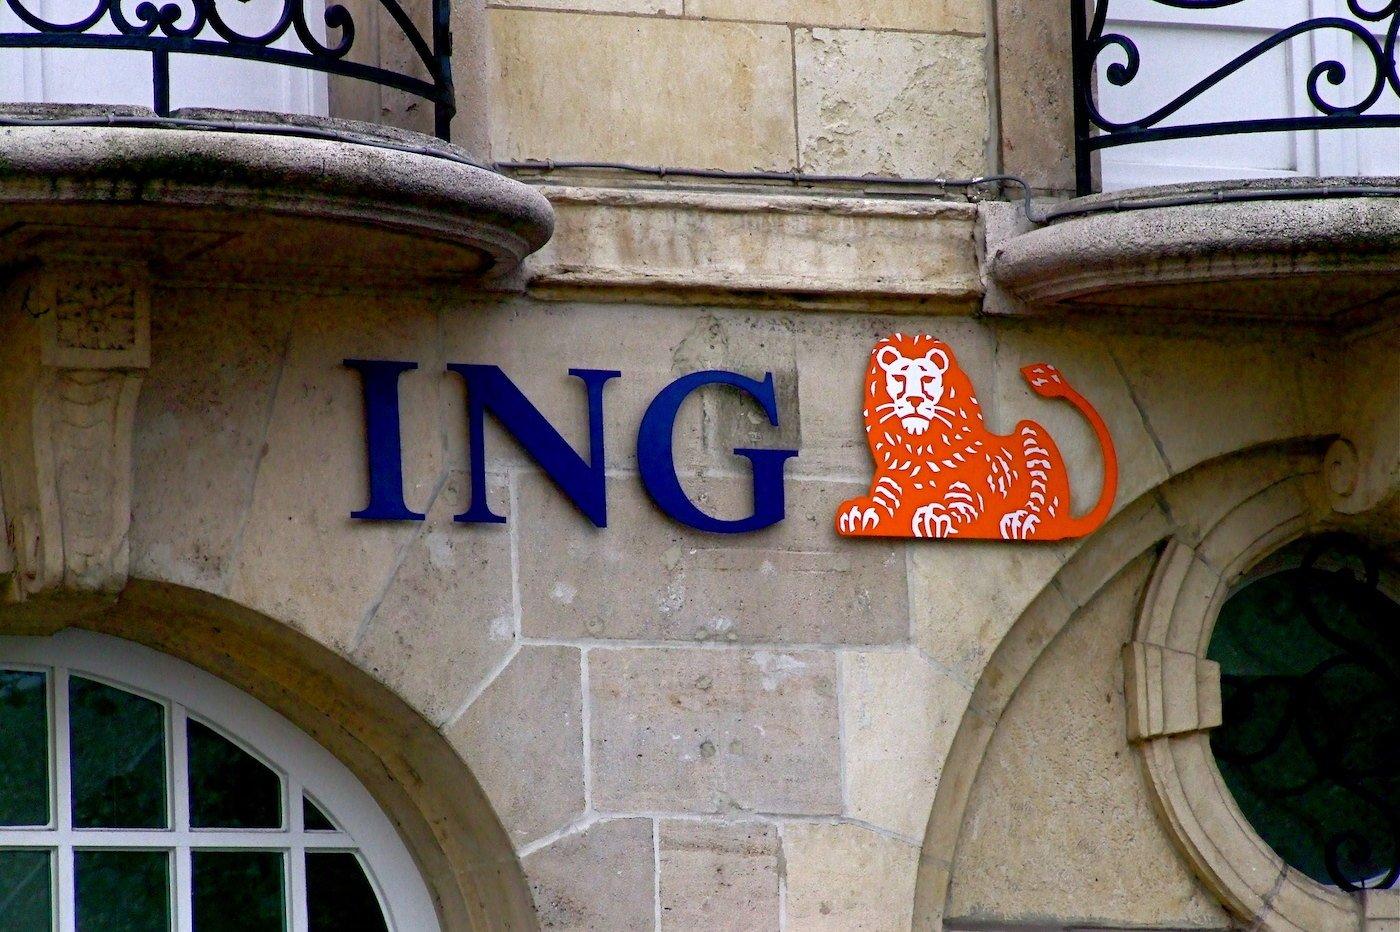 ING va stocker et protéger vos crypto-monnaies